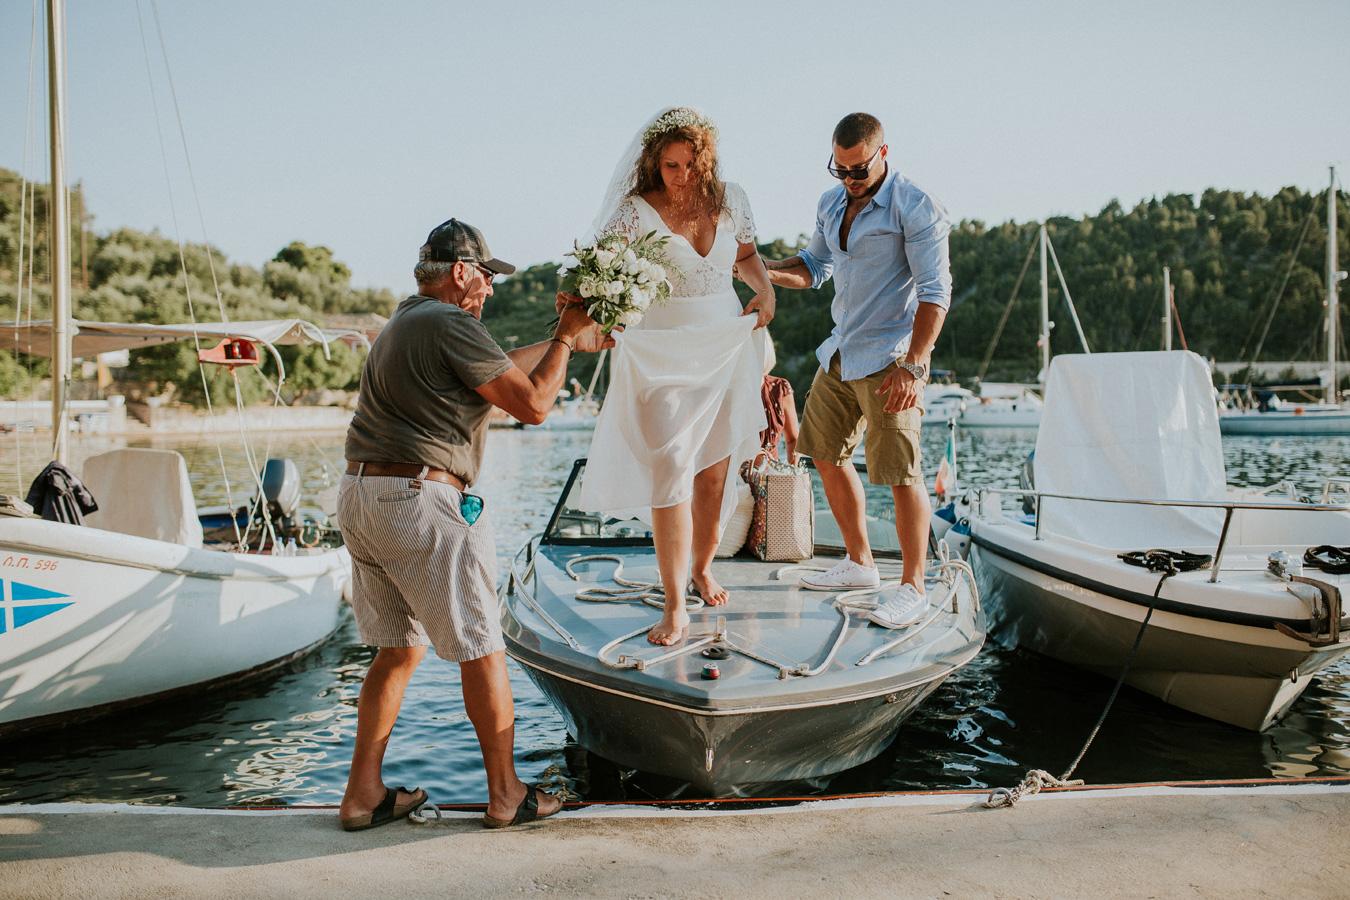 054-bryllupsfotograf-oslo-destinasjonsbryllup-fotograf-tone-tvedt.jpg